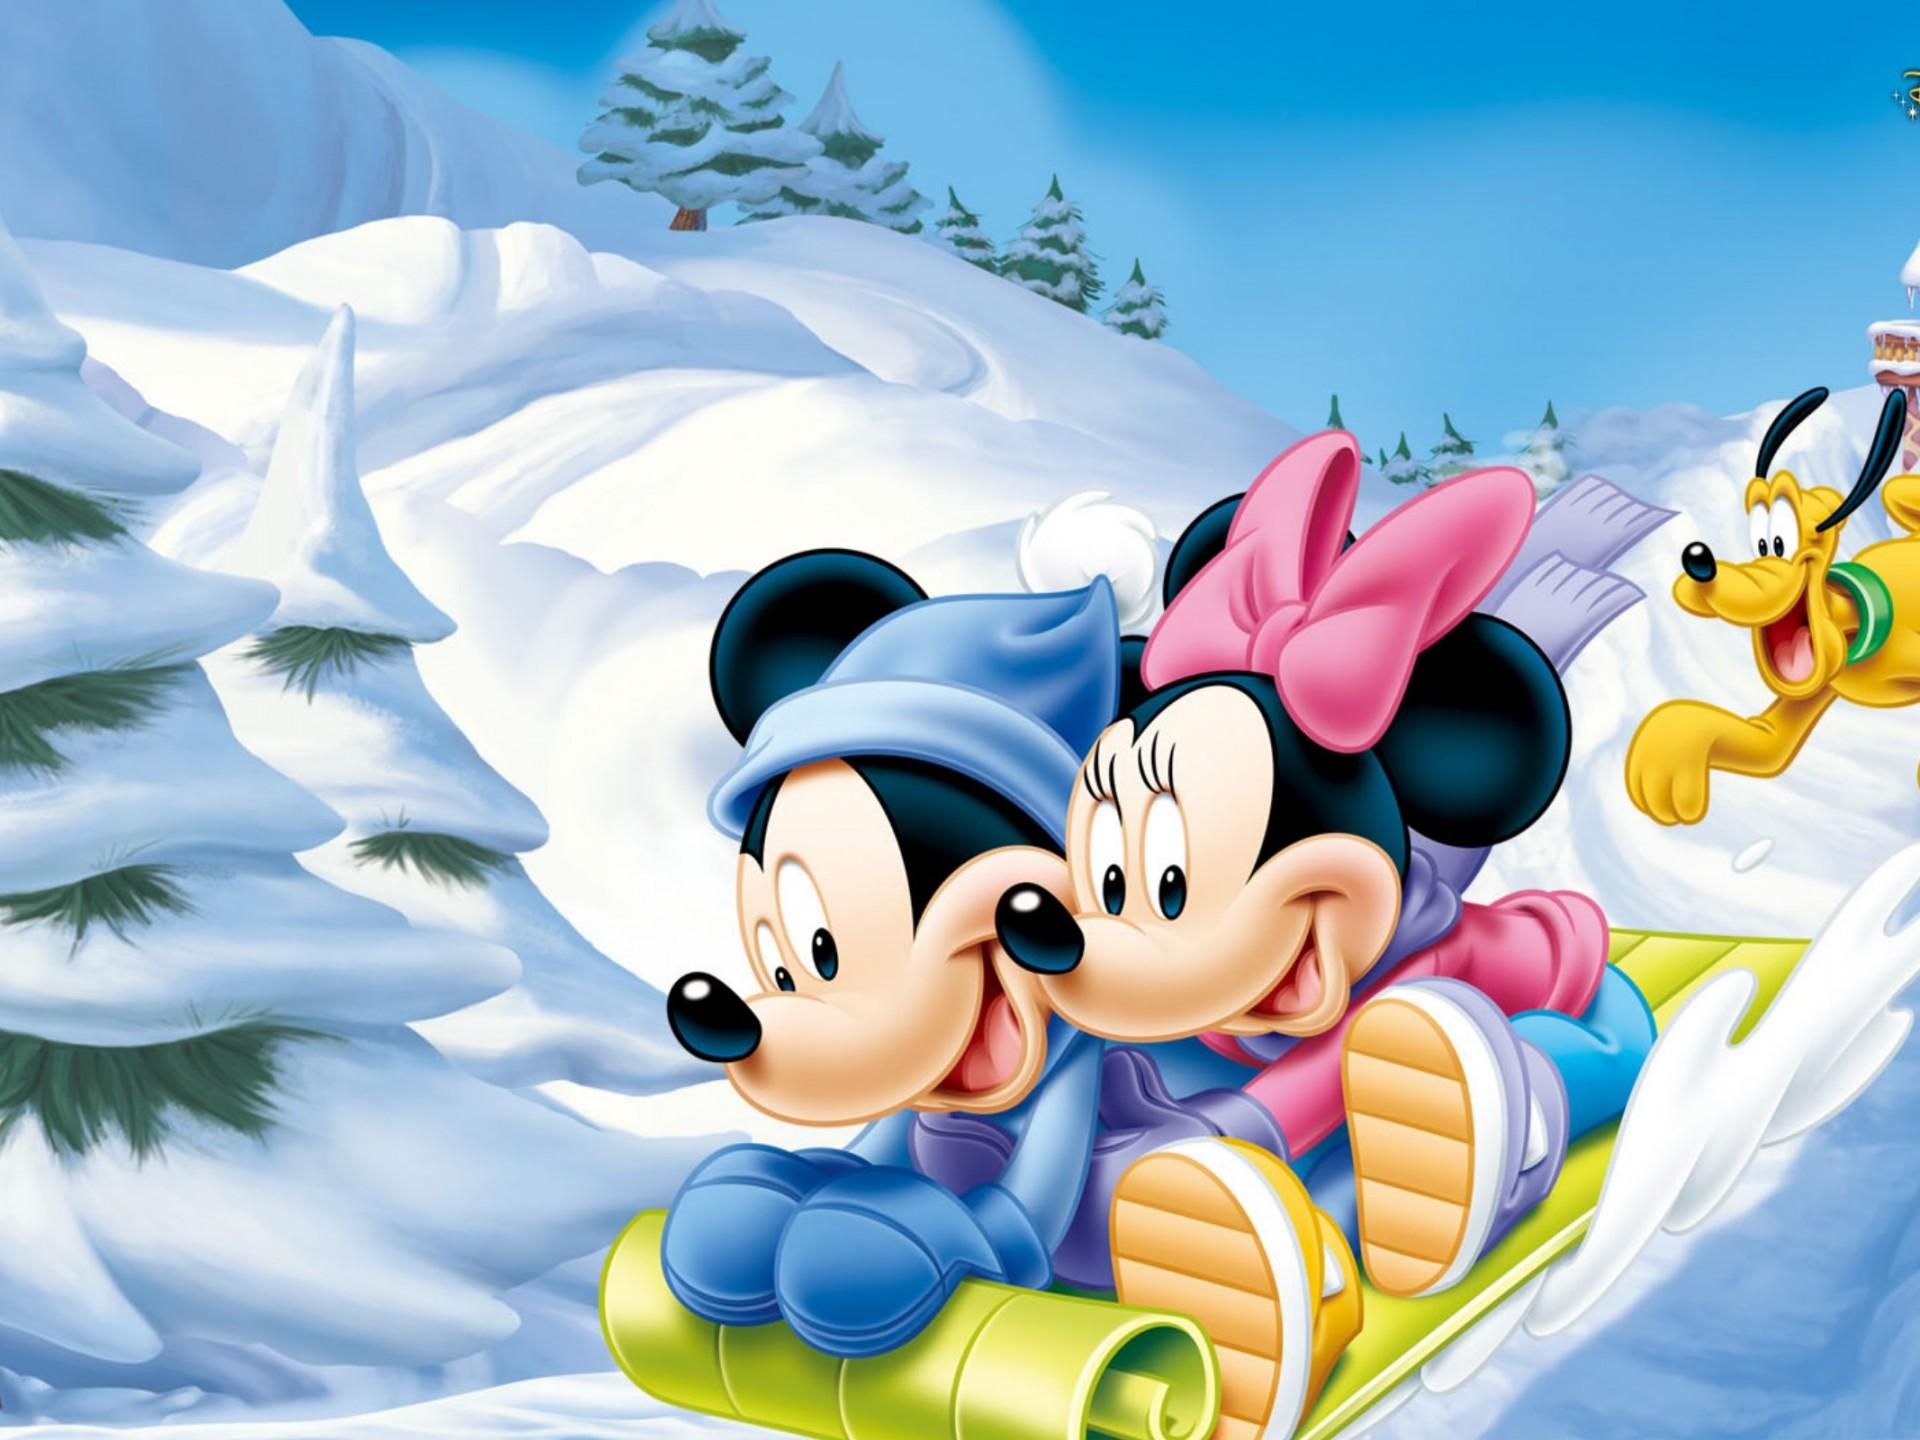 free valentine wallpapers for desktop Download The Disney 1920x1440